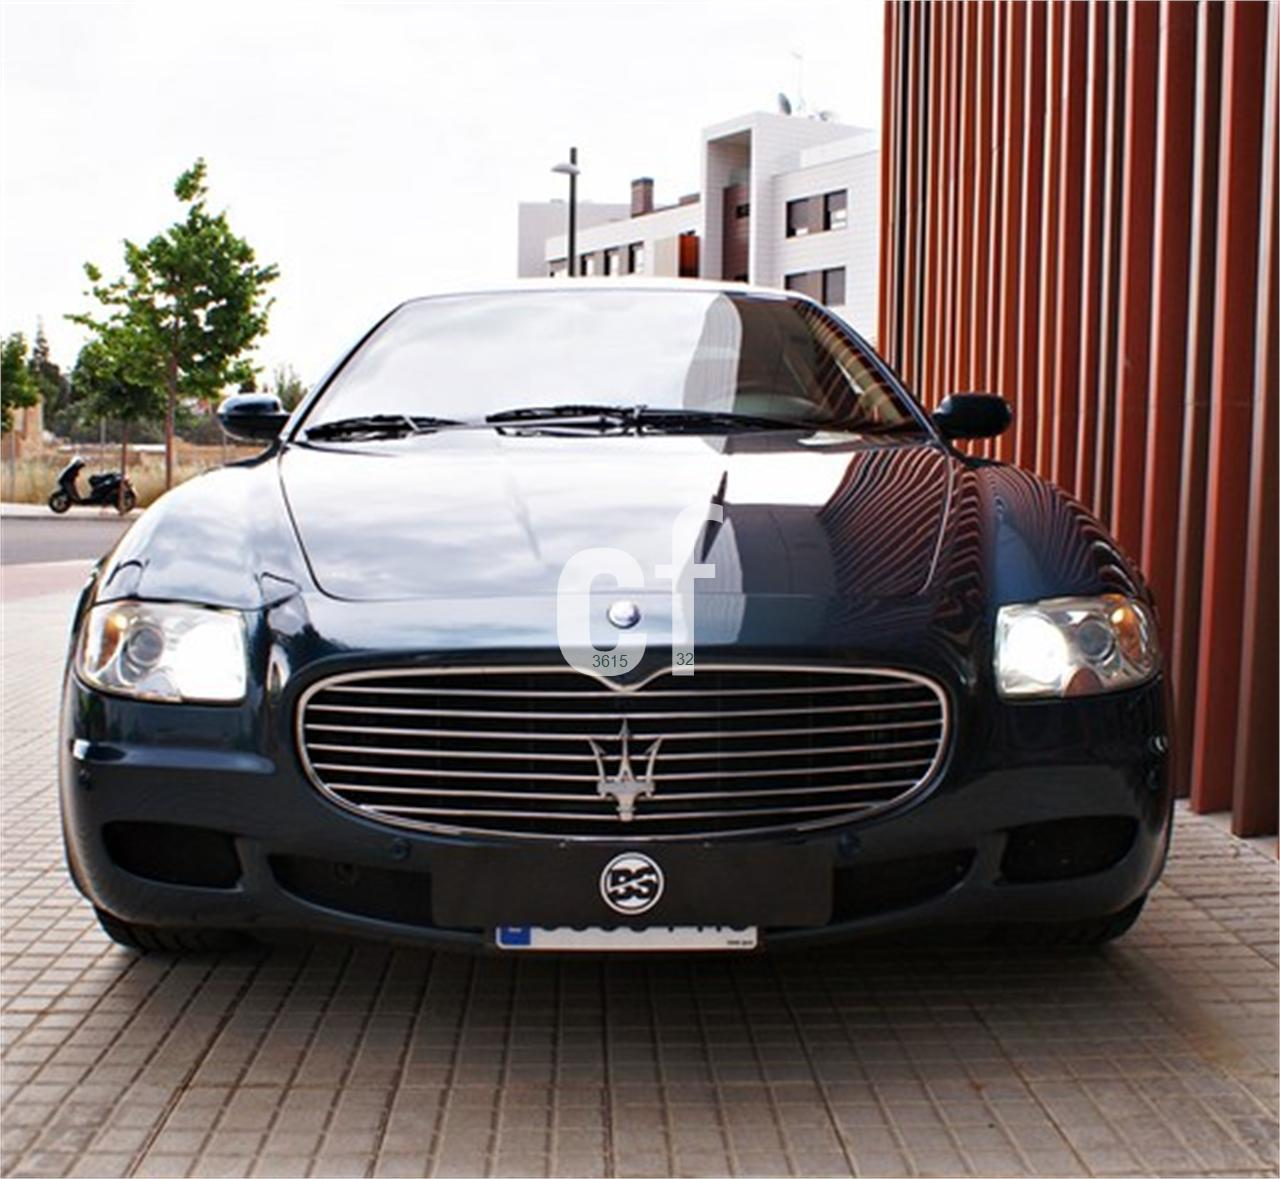 MASERATI Quattroporte de venta de venta por 32000